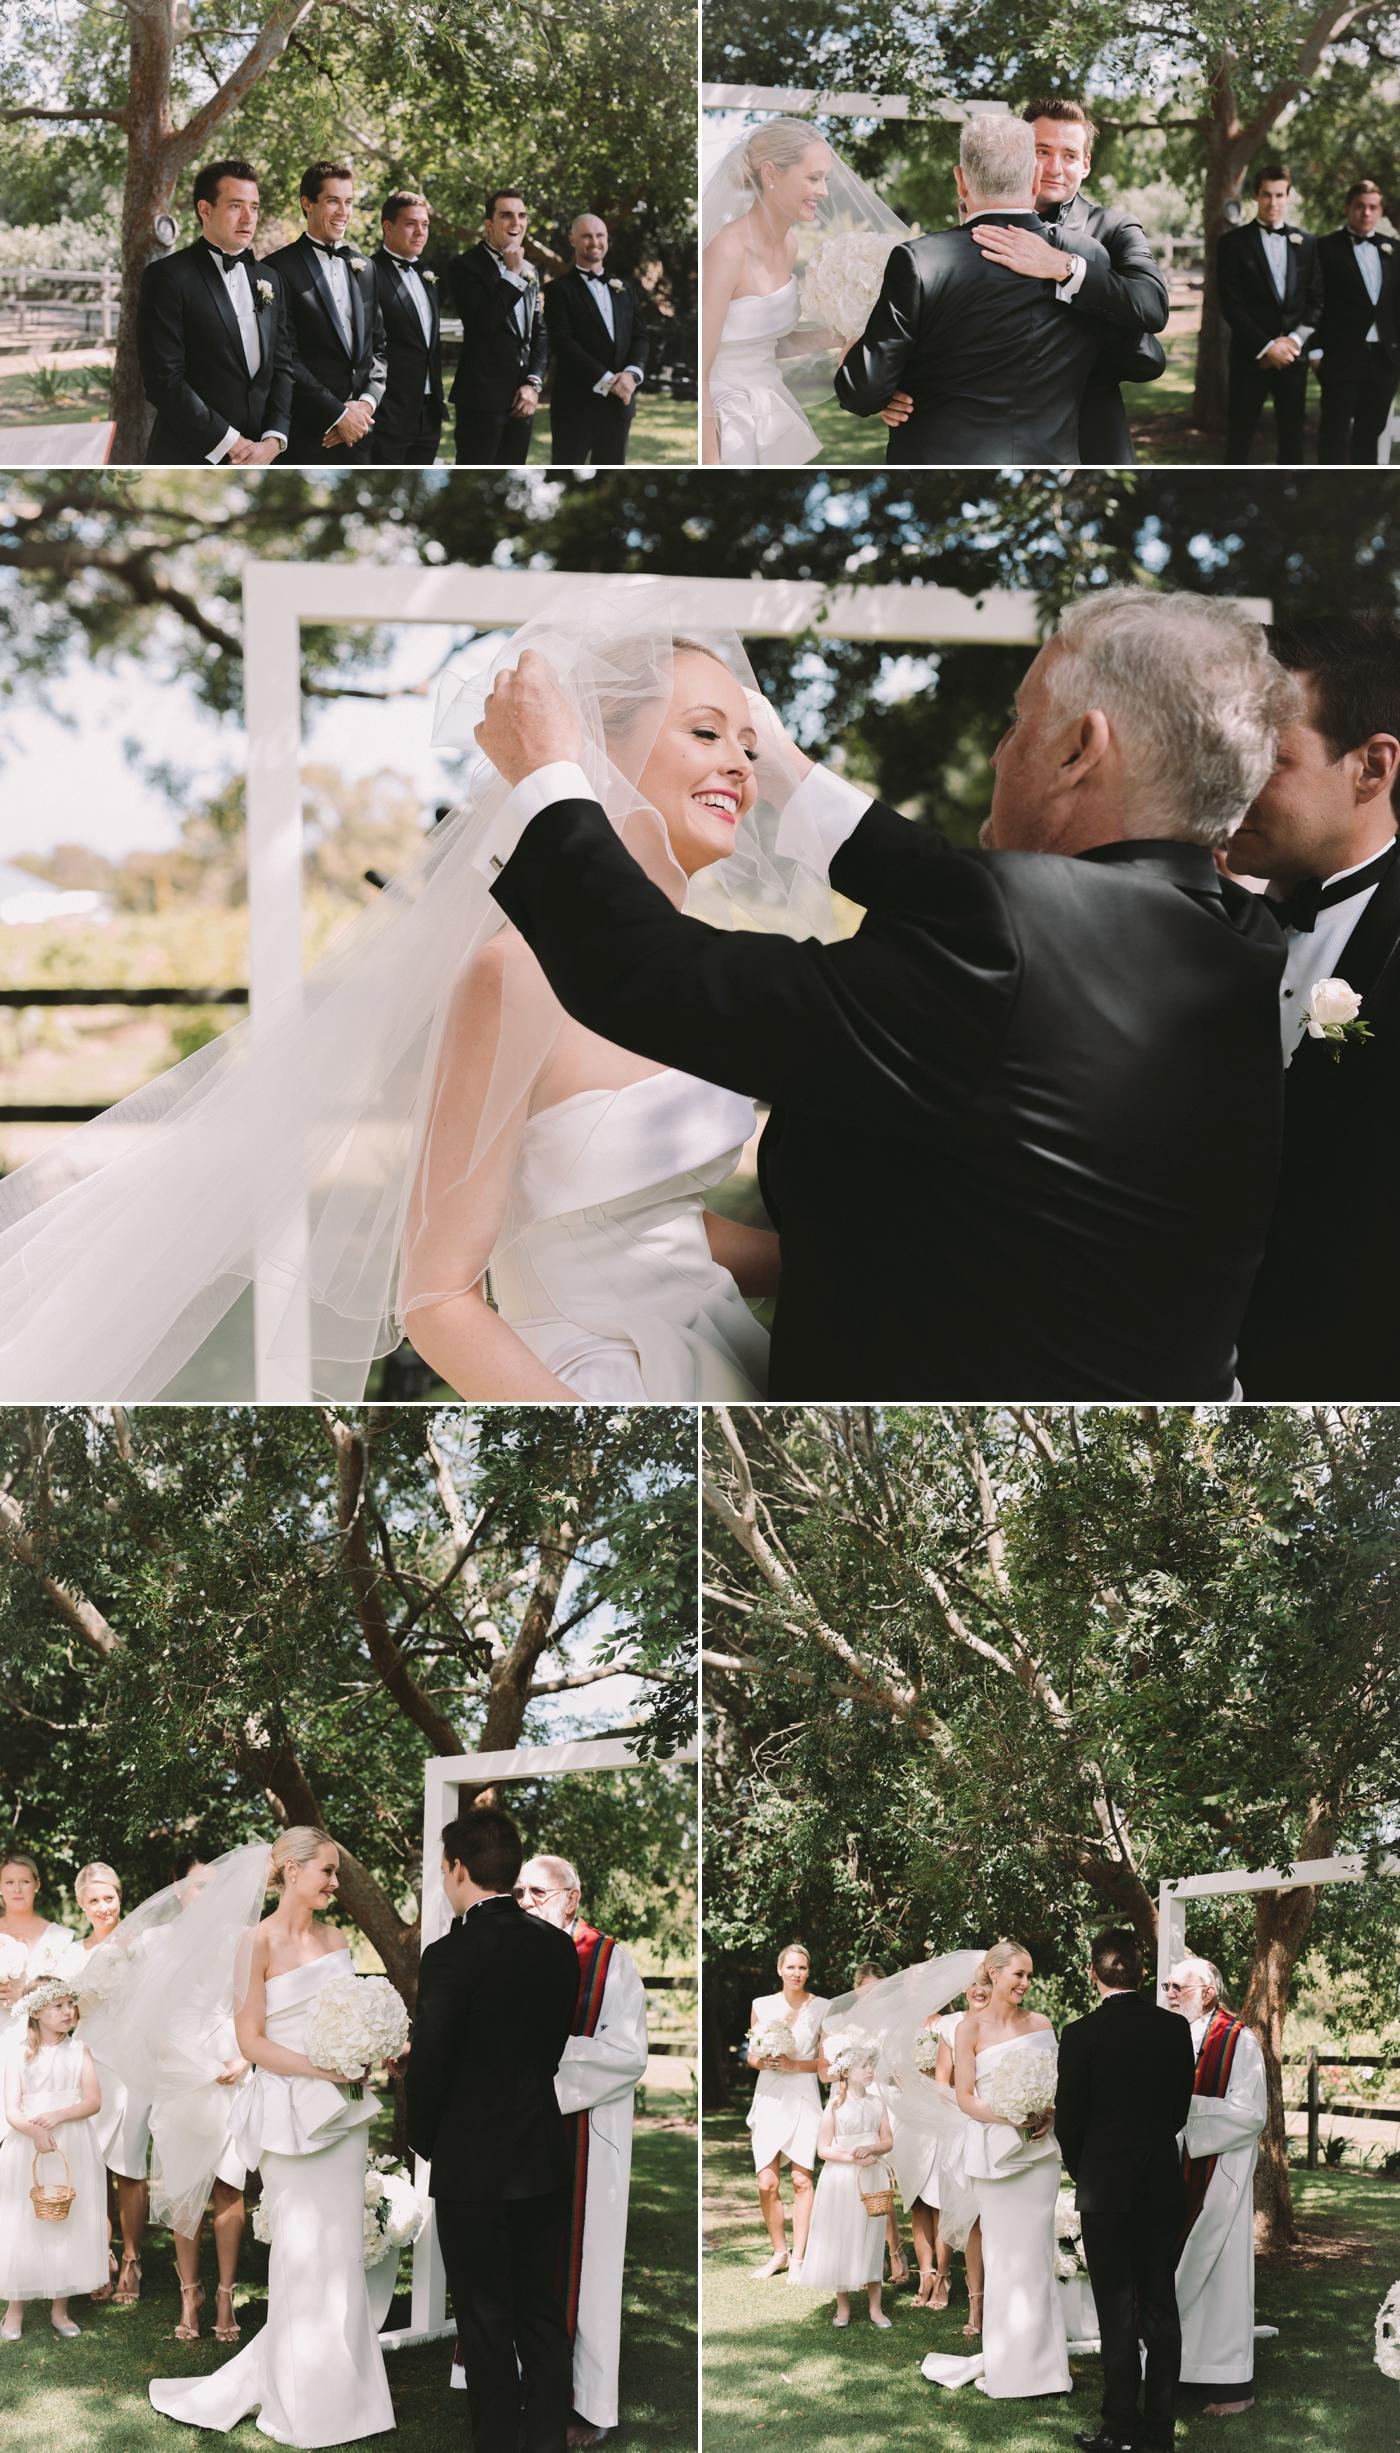 Bec & Brad - Waverley Estate Wedding - Natural Wedding Photographer in Adelaide - www.katherineschultzphotography.com 32